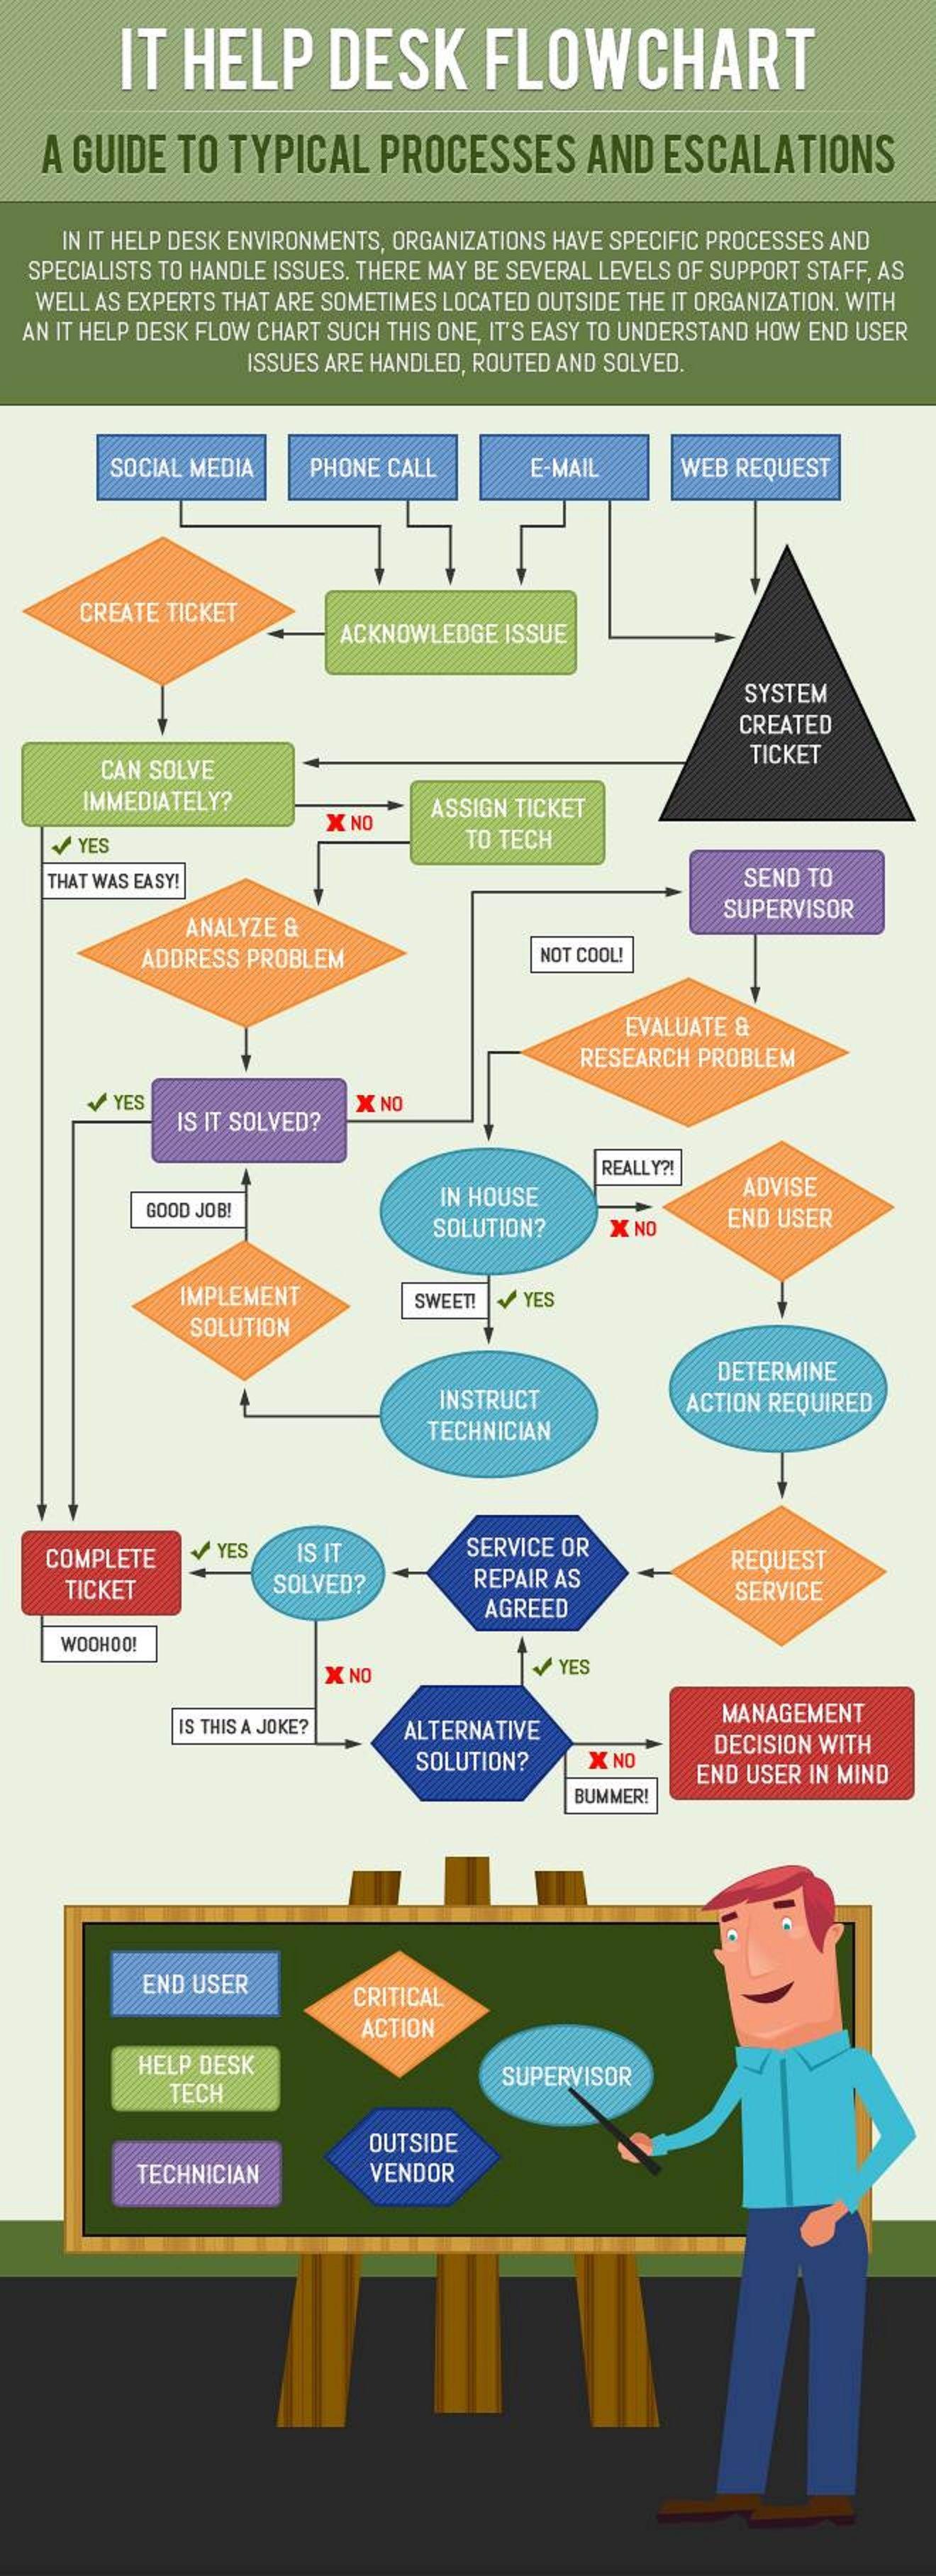 It Help Desk Flowchart Help Desk Business Management Degree Flow Chart